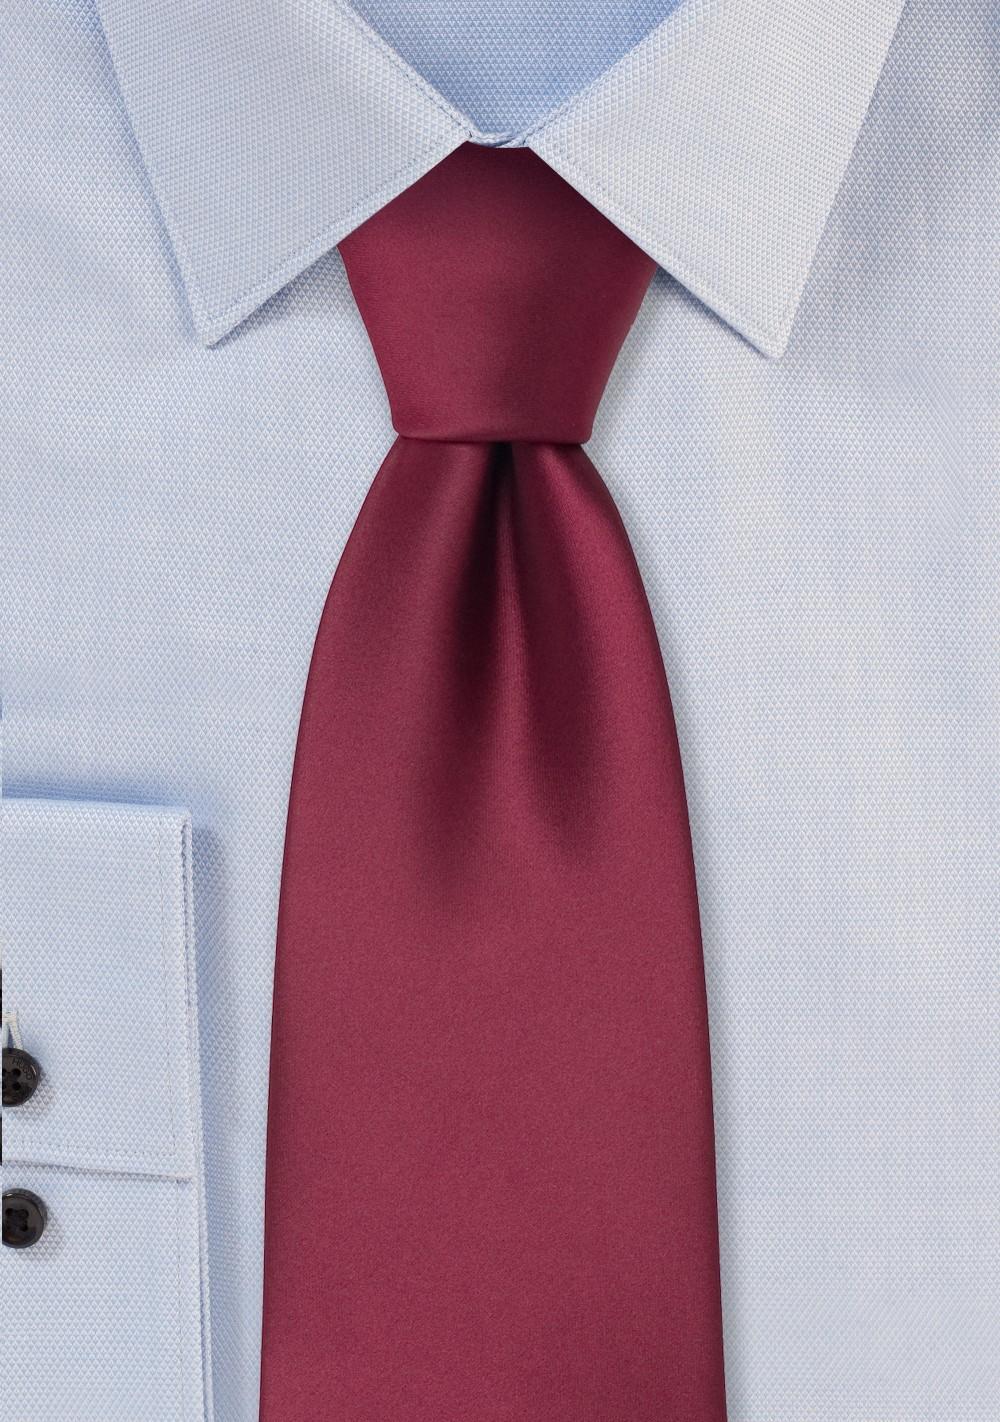 Solid color ties - Solid burgundy red tie